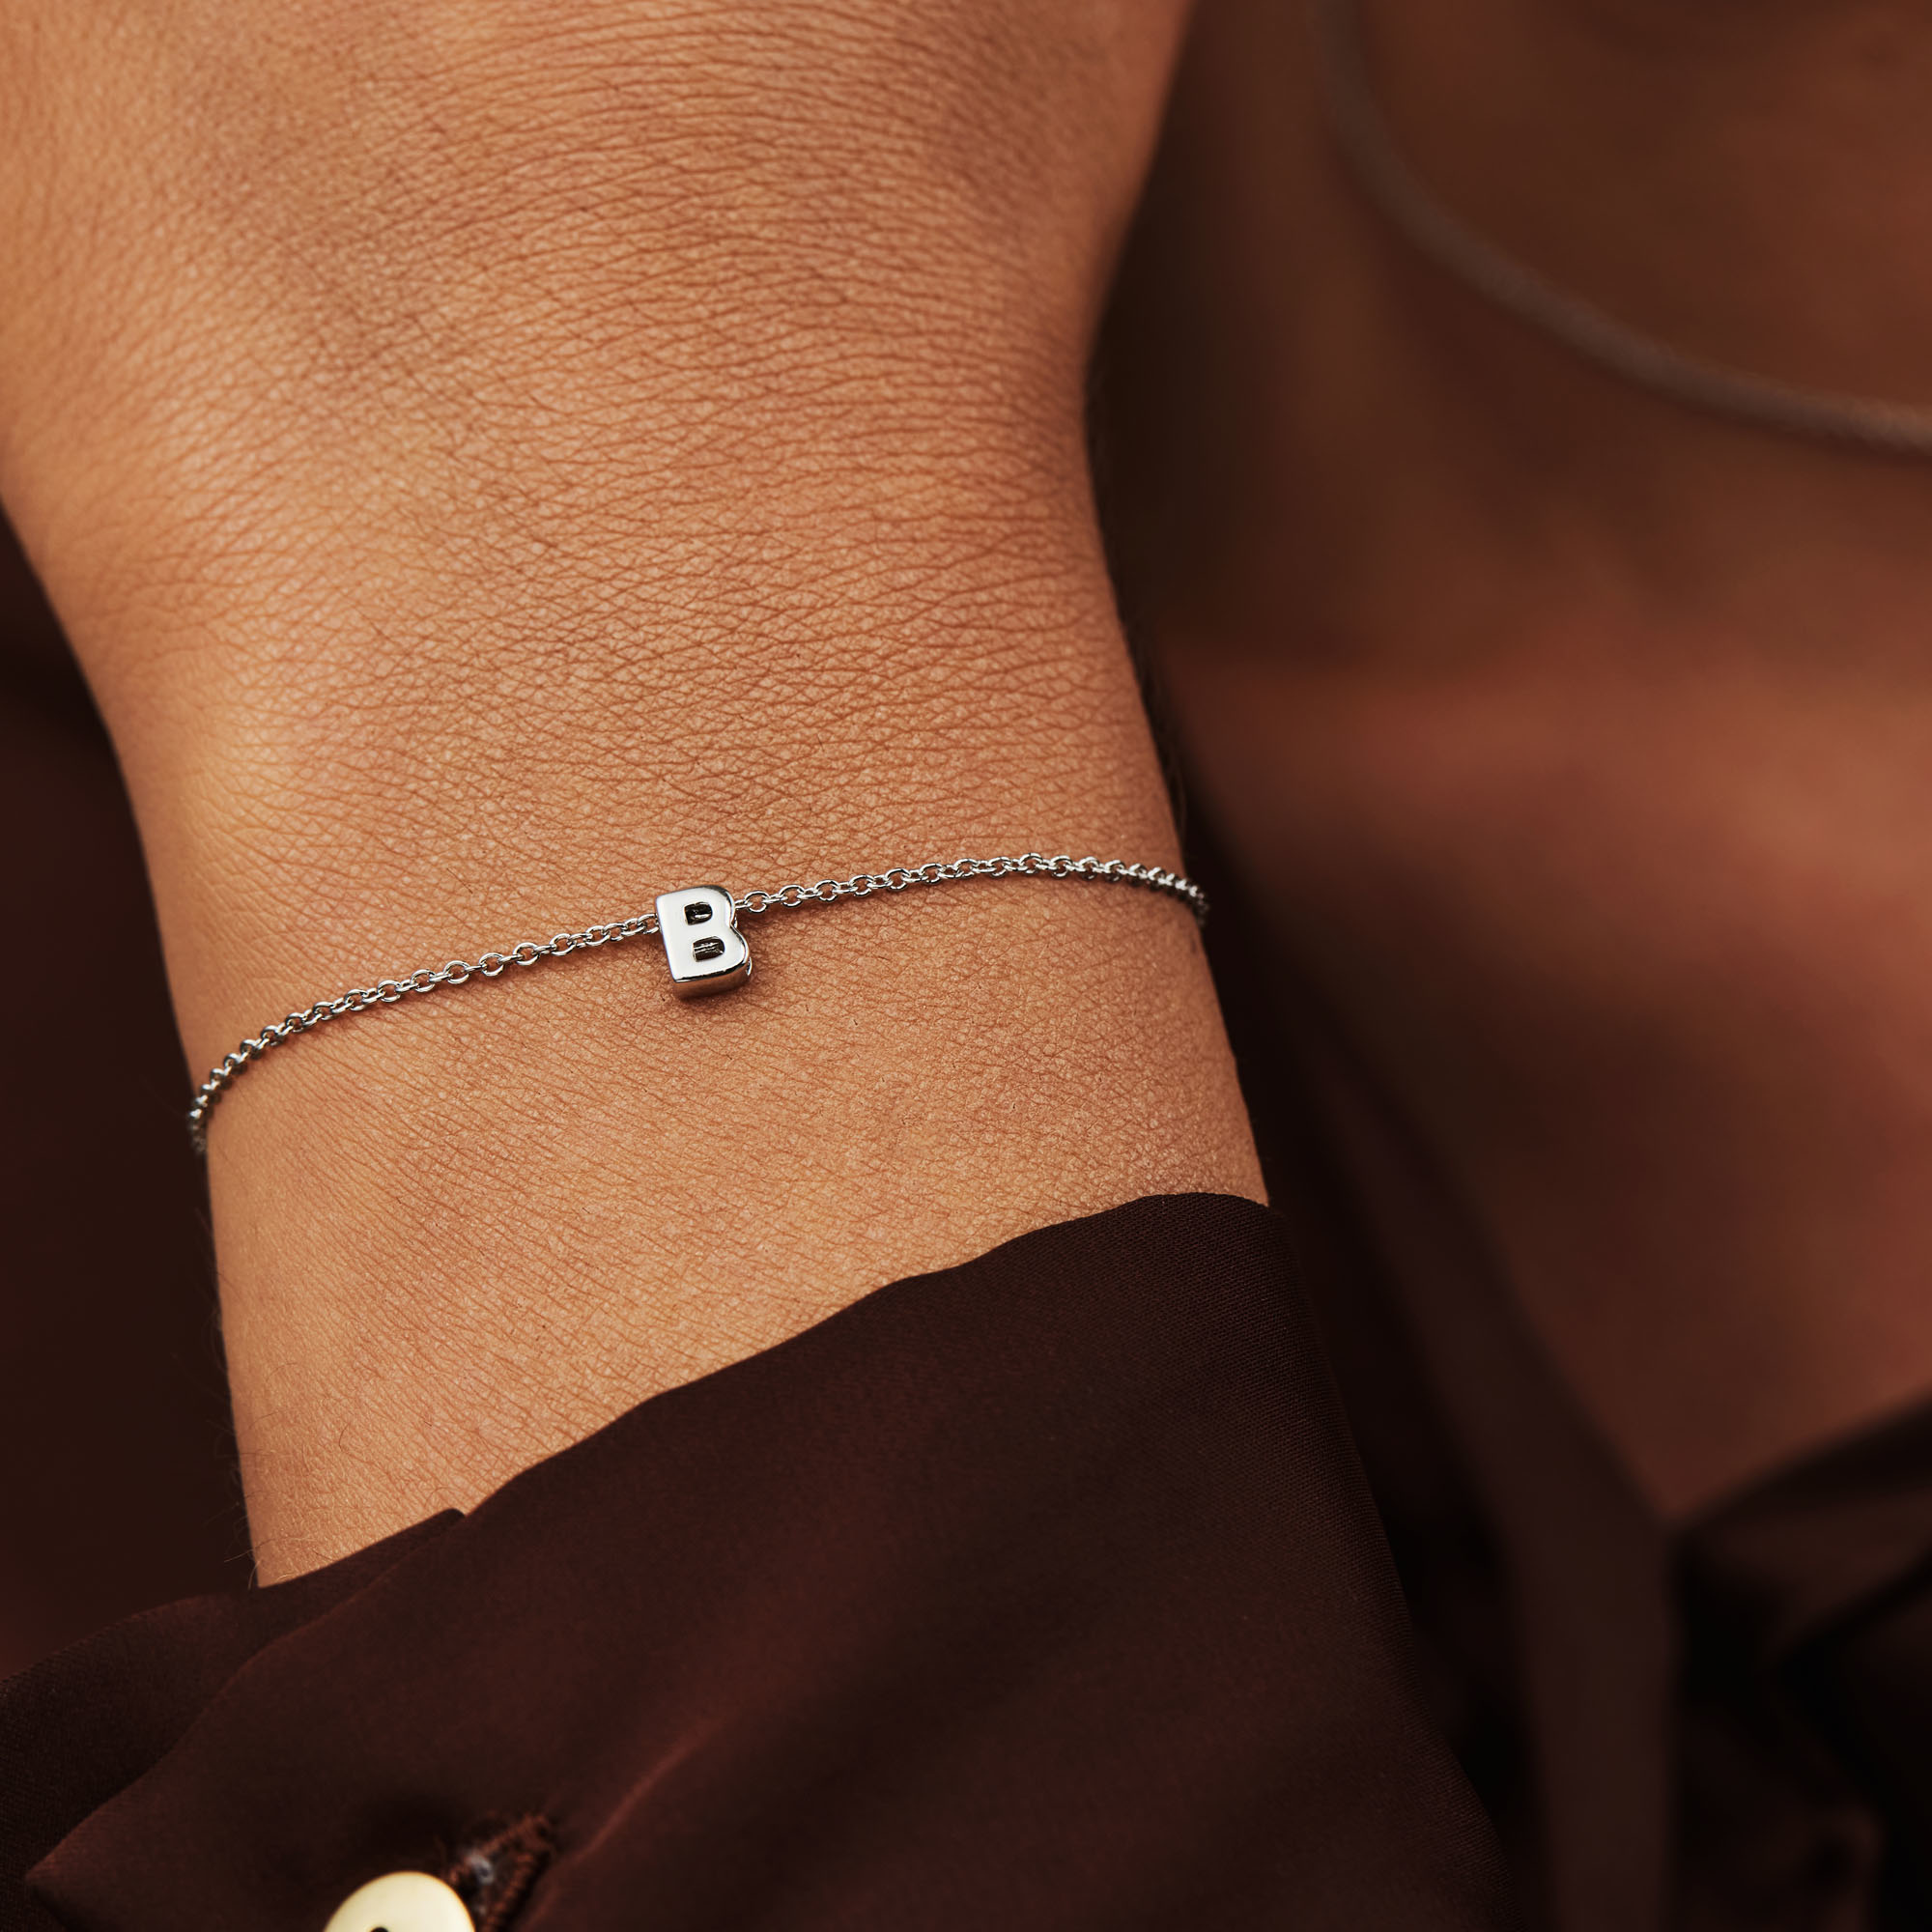 Selected Jewels Julie Chloé bracelet initiale en argent sterling 925